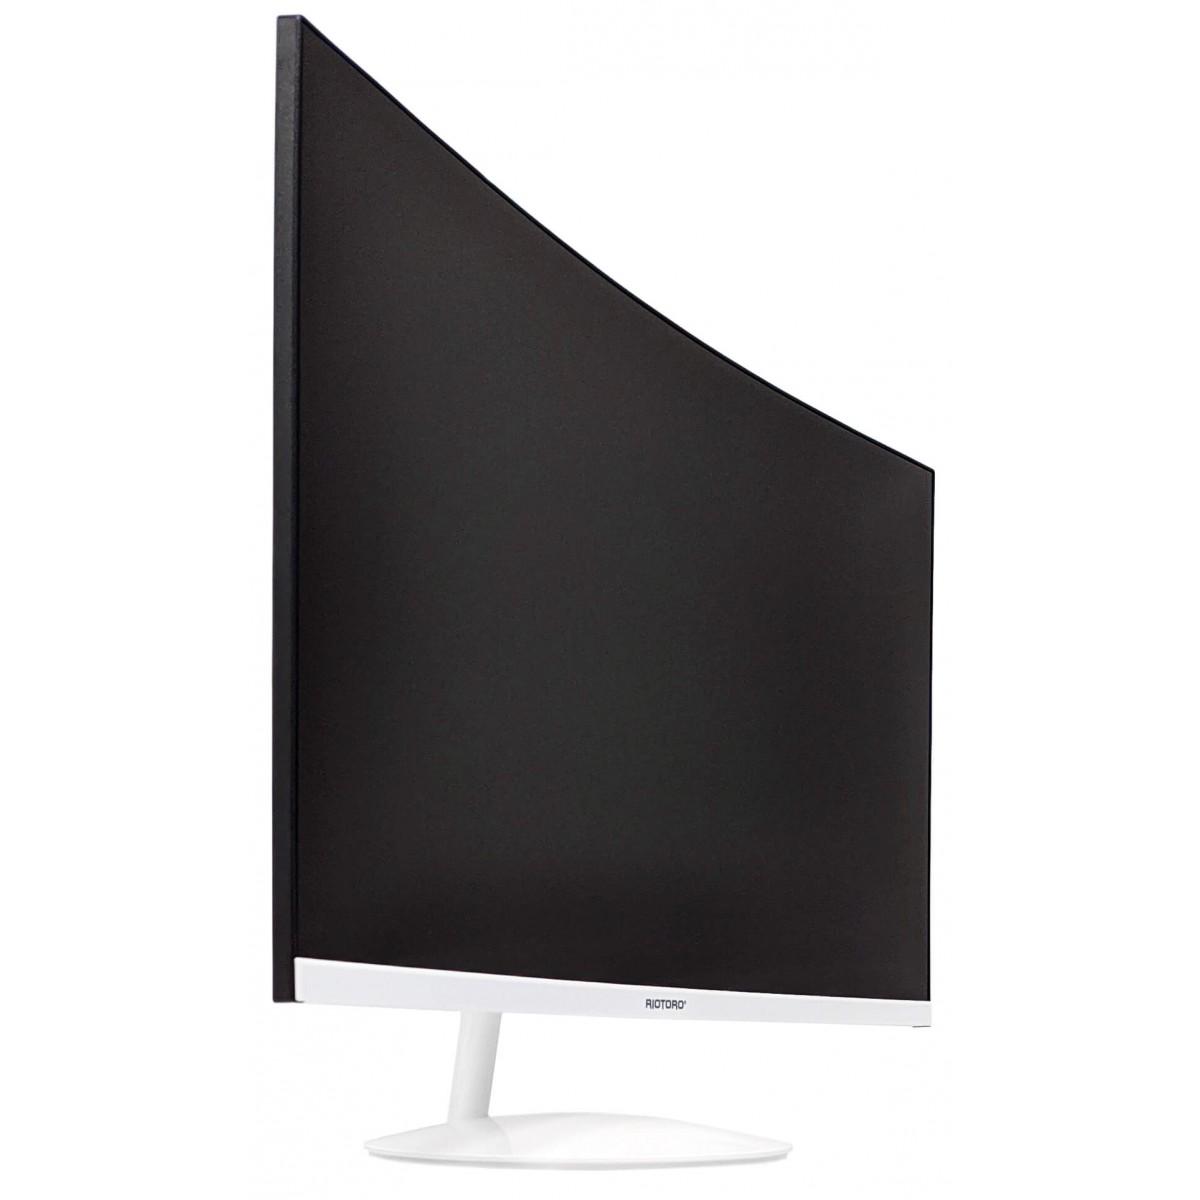 Monitor Gamer Riotoro, Stingray CX27, Curvo, 27 Pol, QHD, HDR, FreeSync, 144HZ, 1ms, DisplayPort, HDMI, White, SR2705C